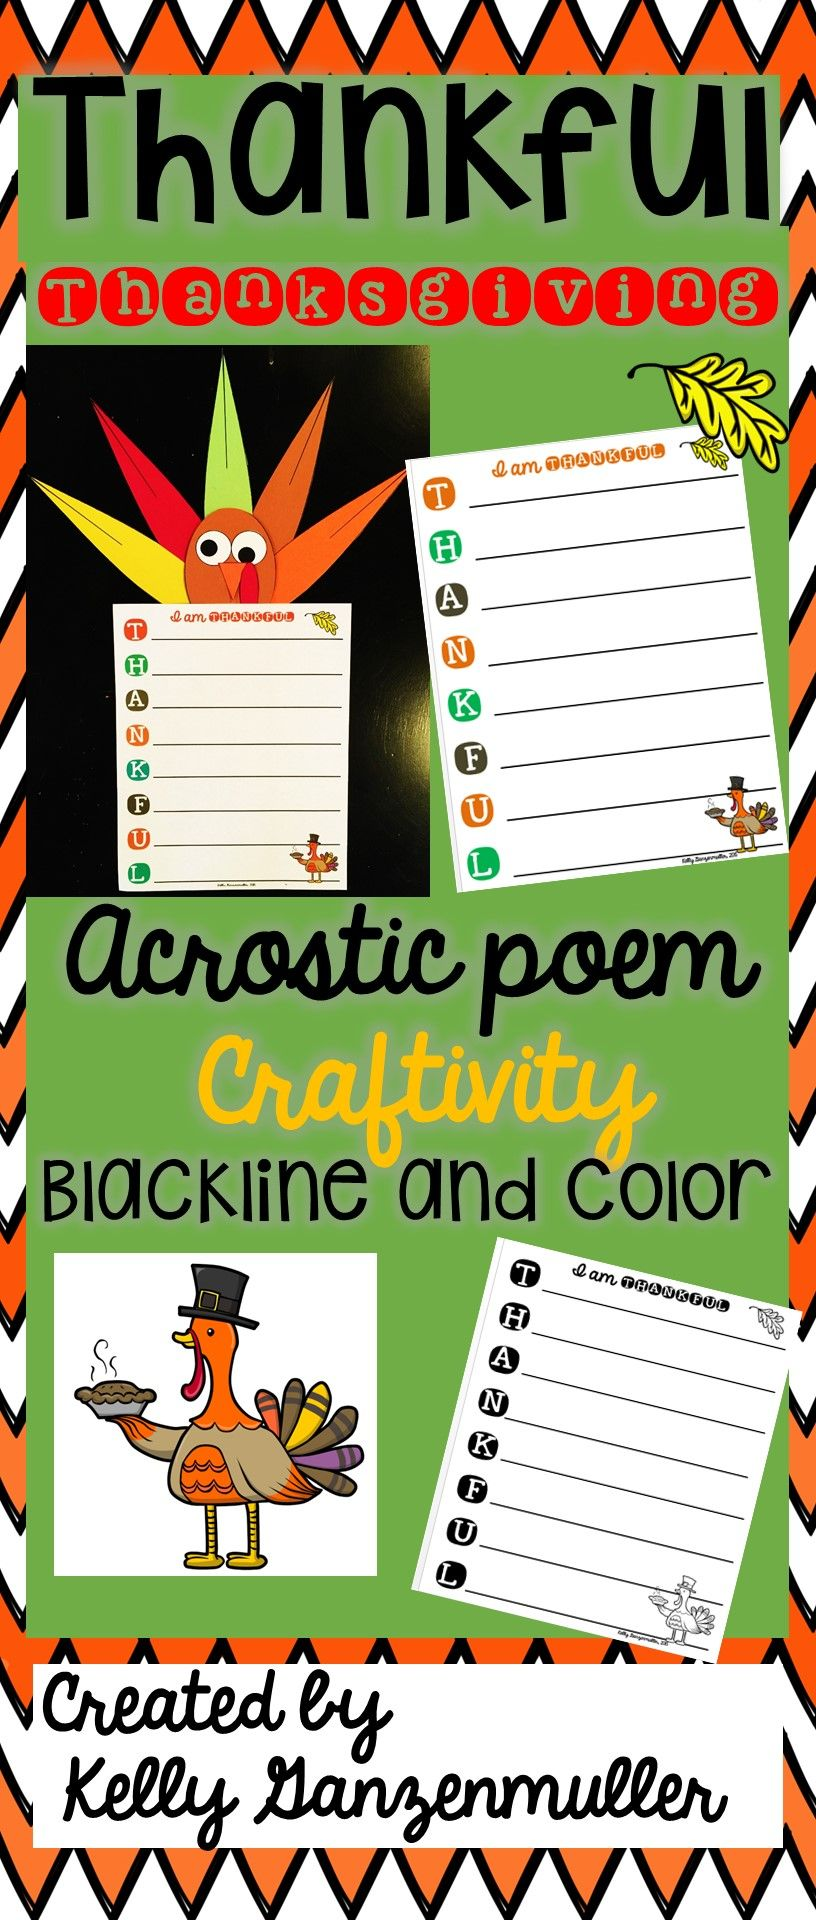 Thankful Thanksgiving Turkey Poem Craftivity | Pinterest | Hallway ...